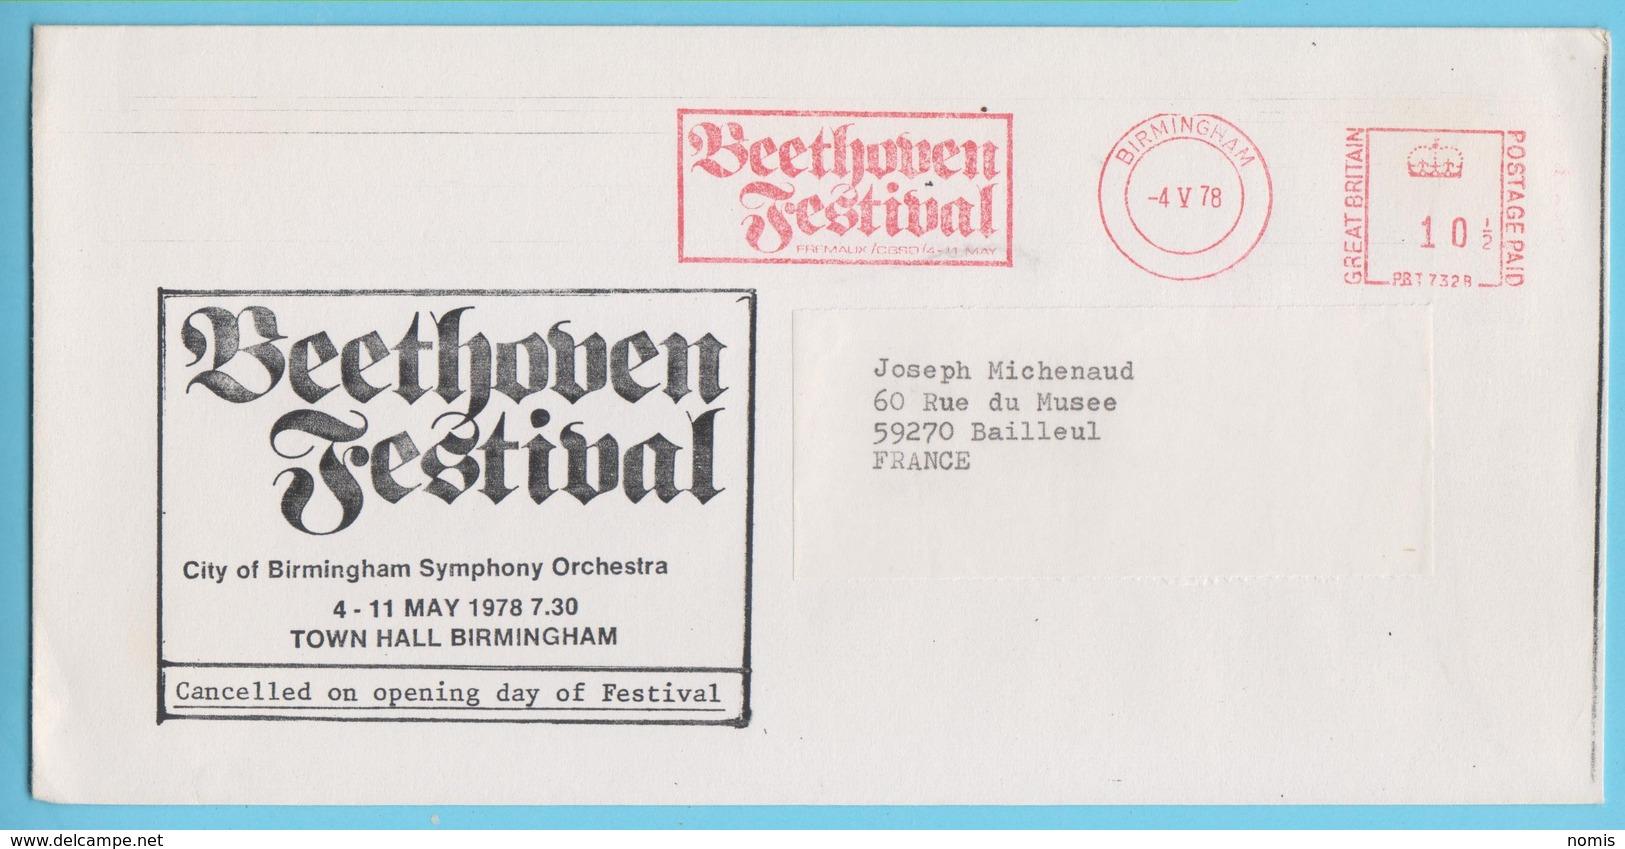 J.M. 28 - EMA - Grande Bretagne - 13 - Festival Beethoven - Compositeur - Musik